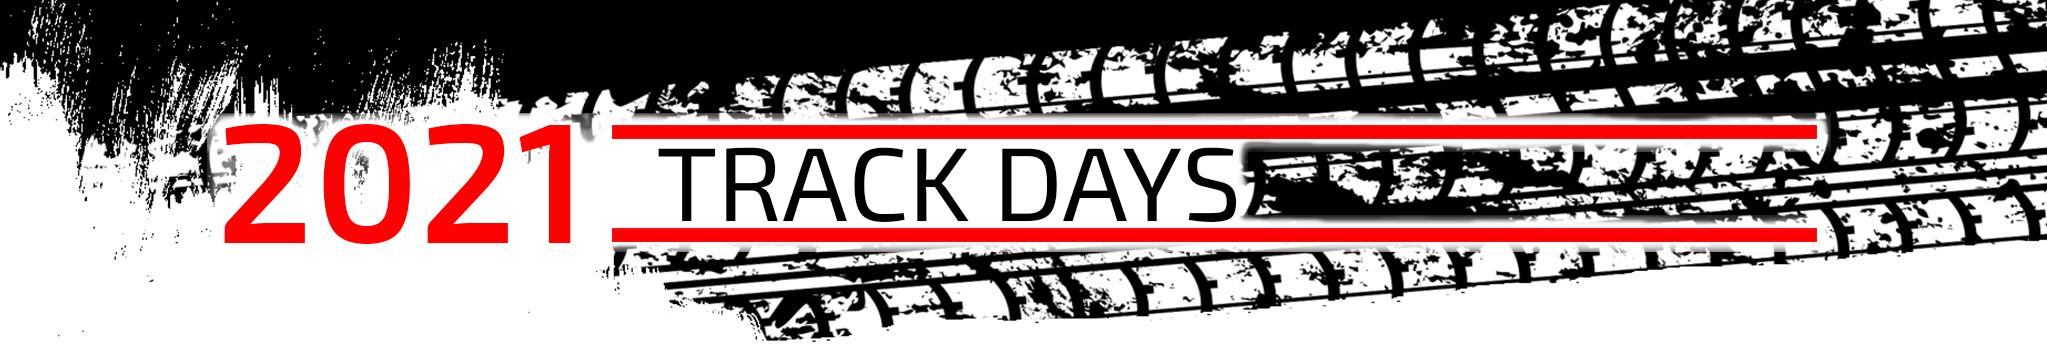 2021 Track Days